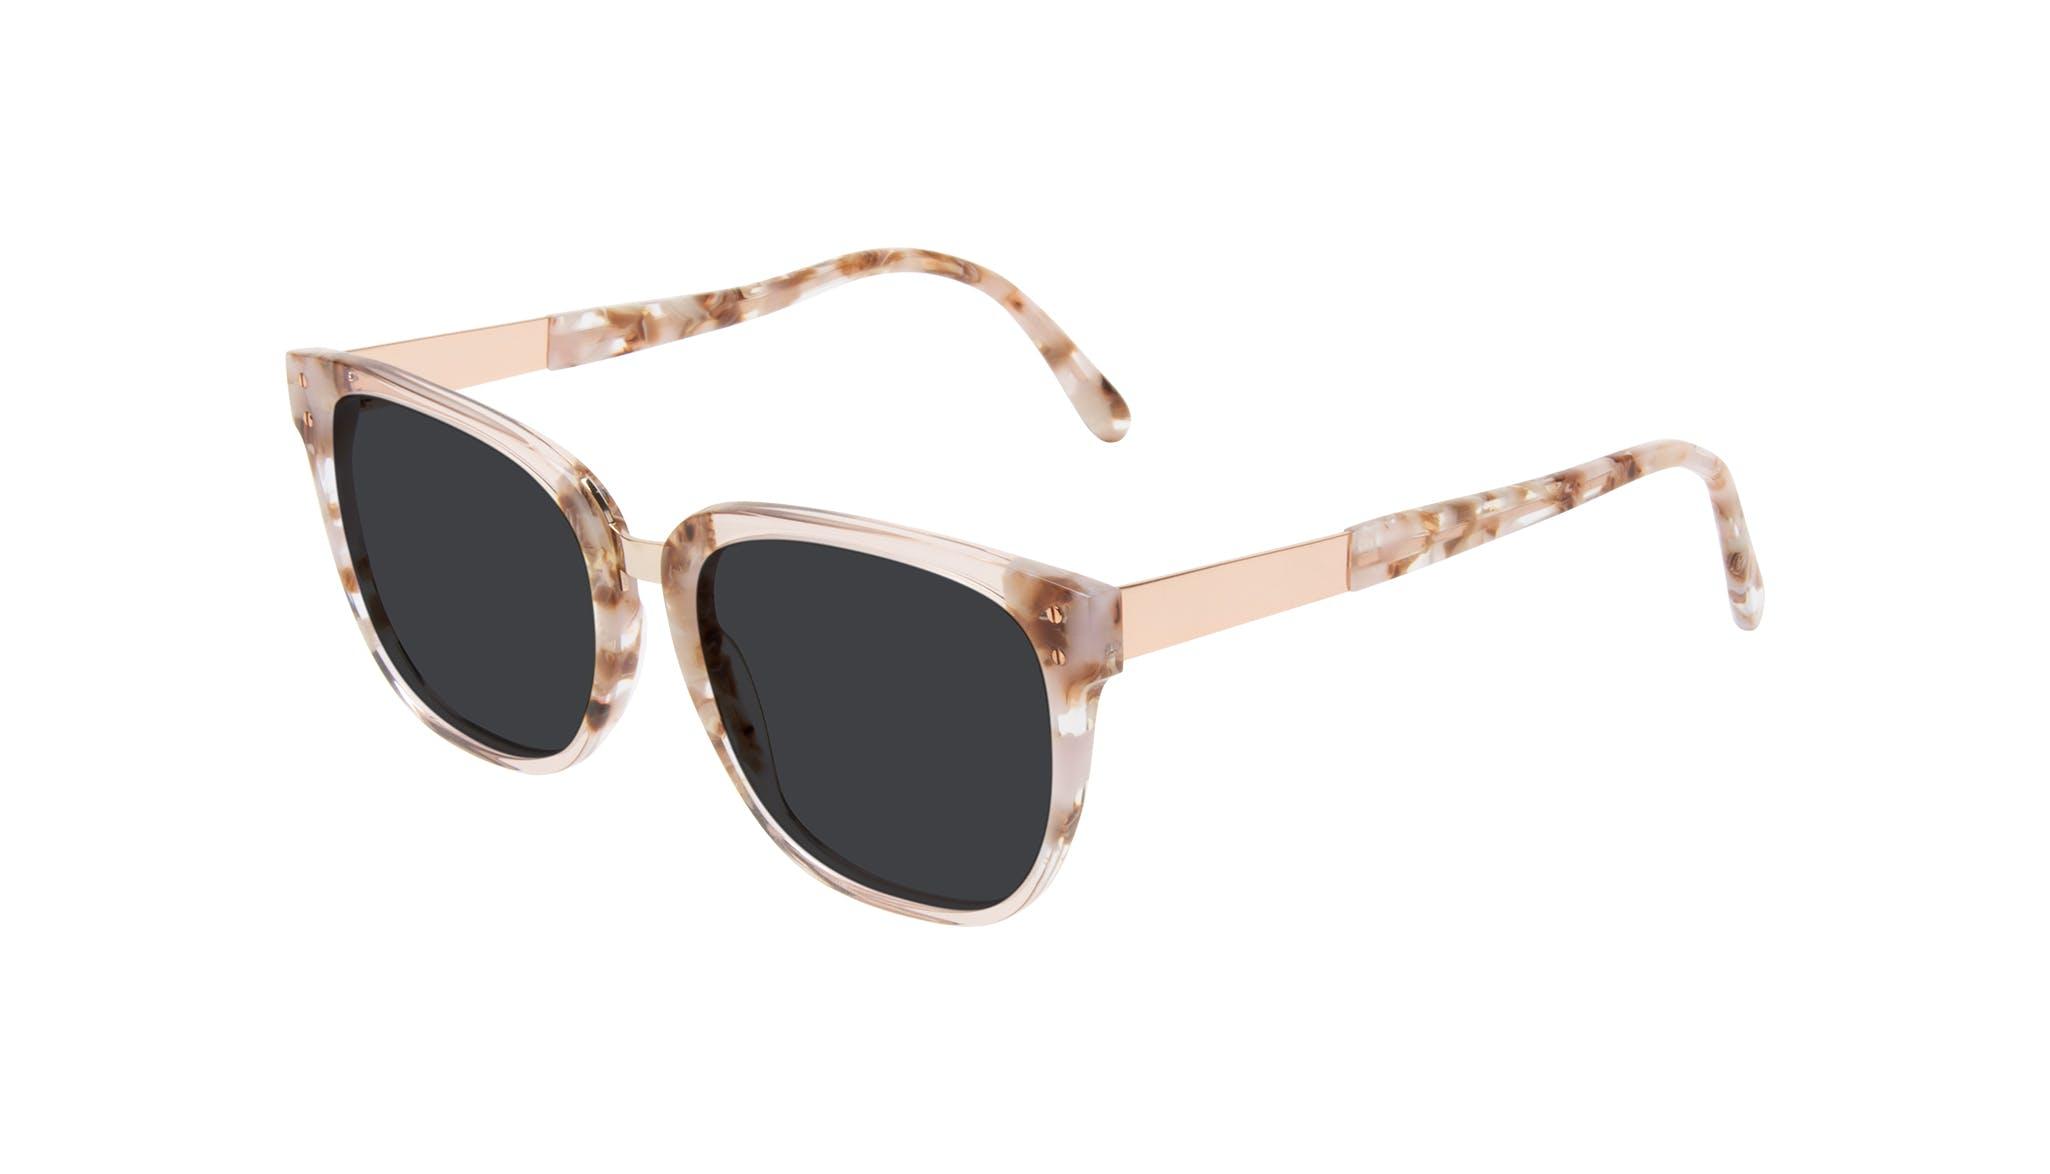 Affordable Fashion Glasses Square Sunglasses Women James Dusty Rose Tilt